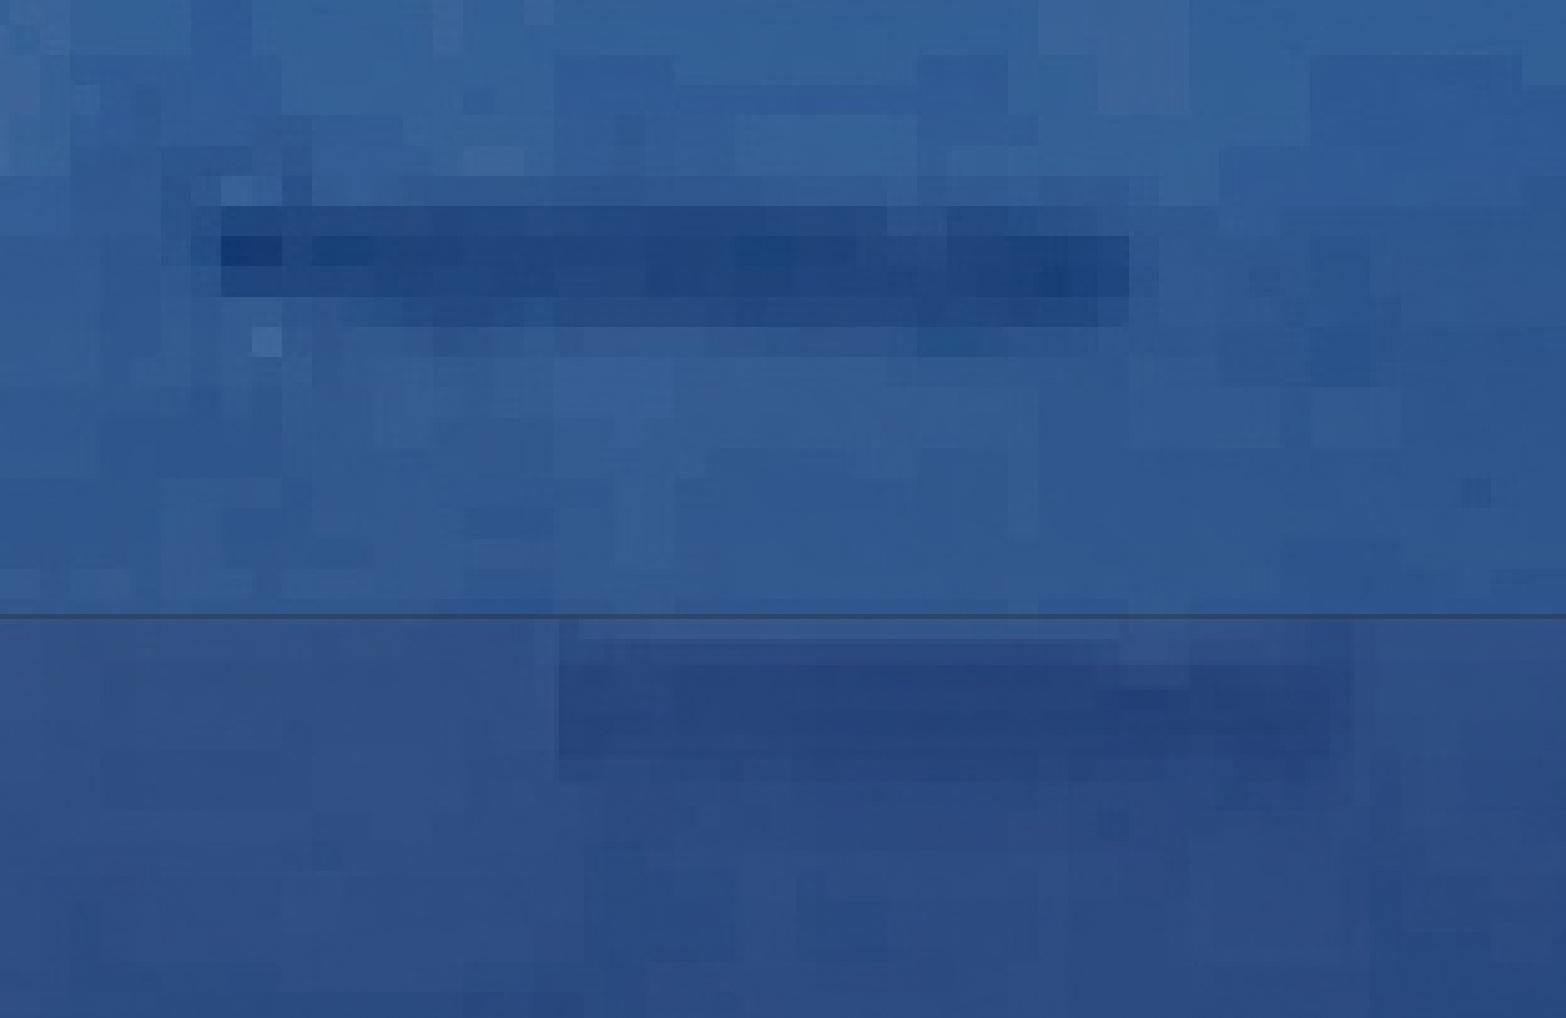 Metabunk 2020-05-31 09-27-27.jpg